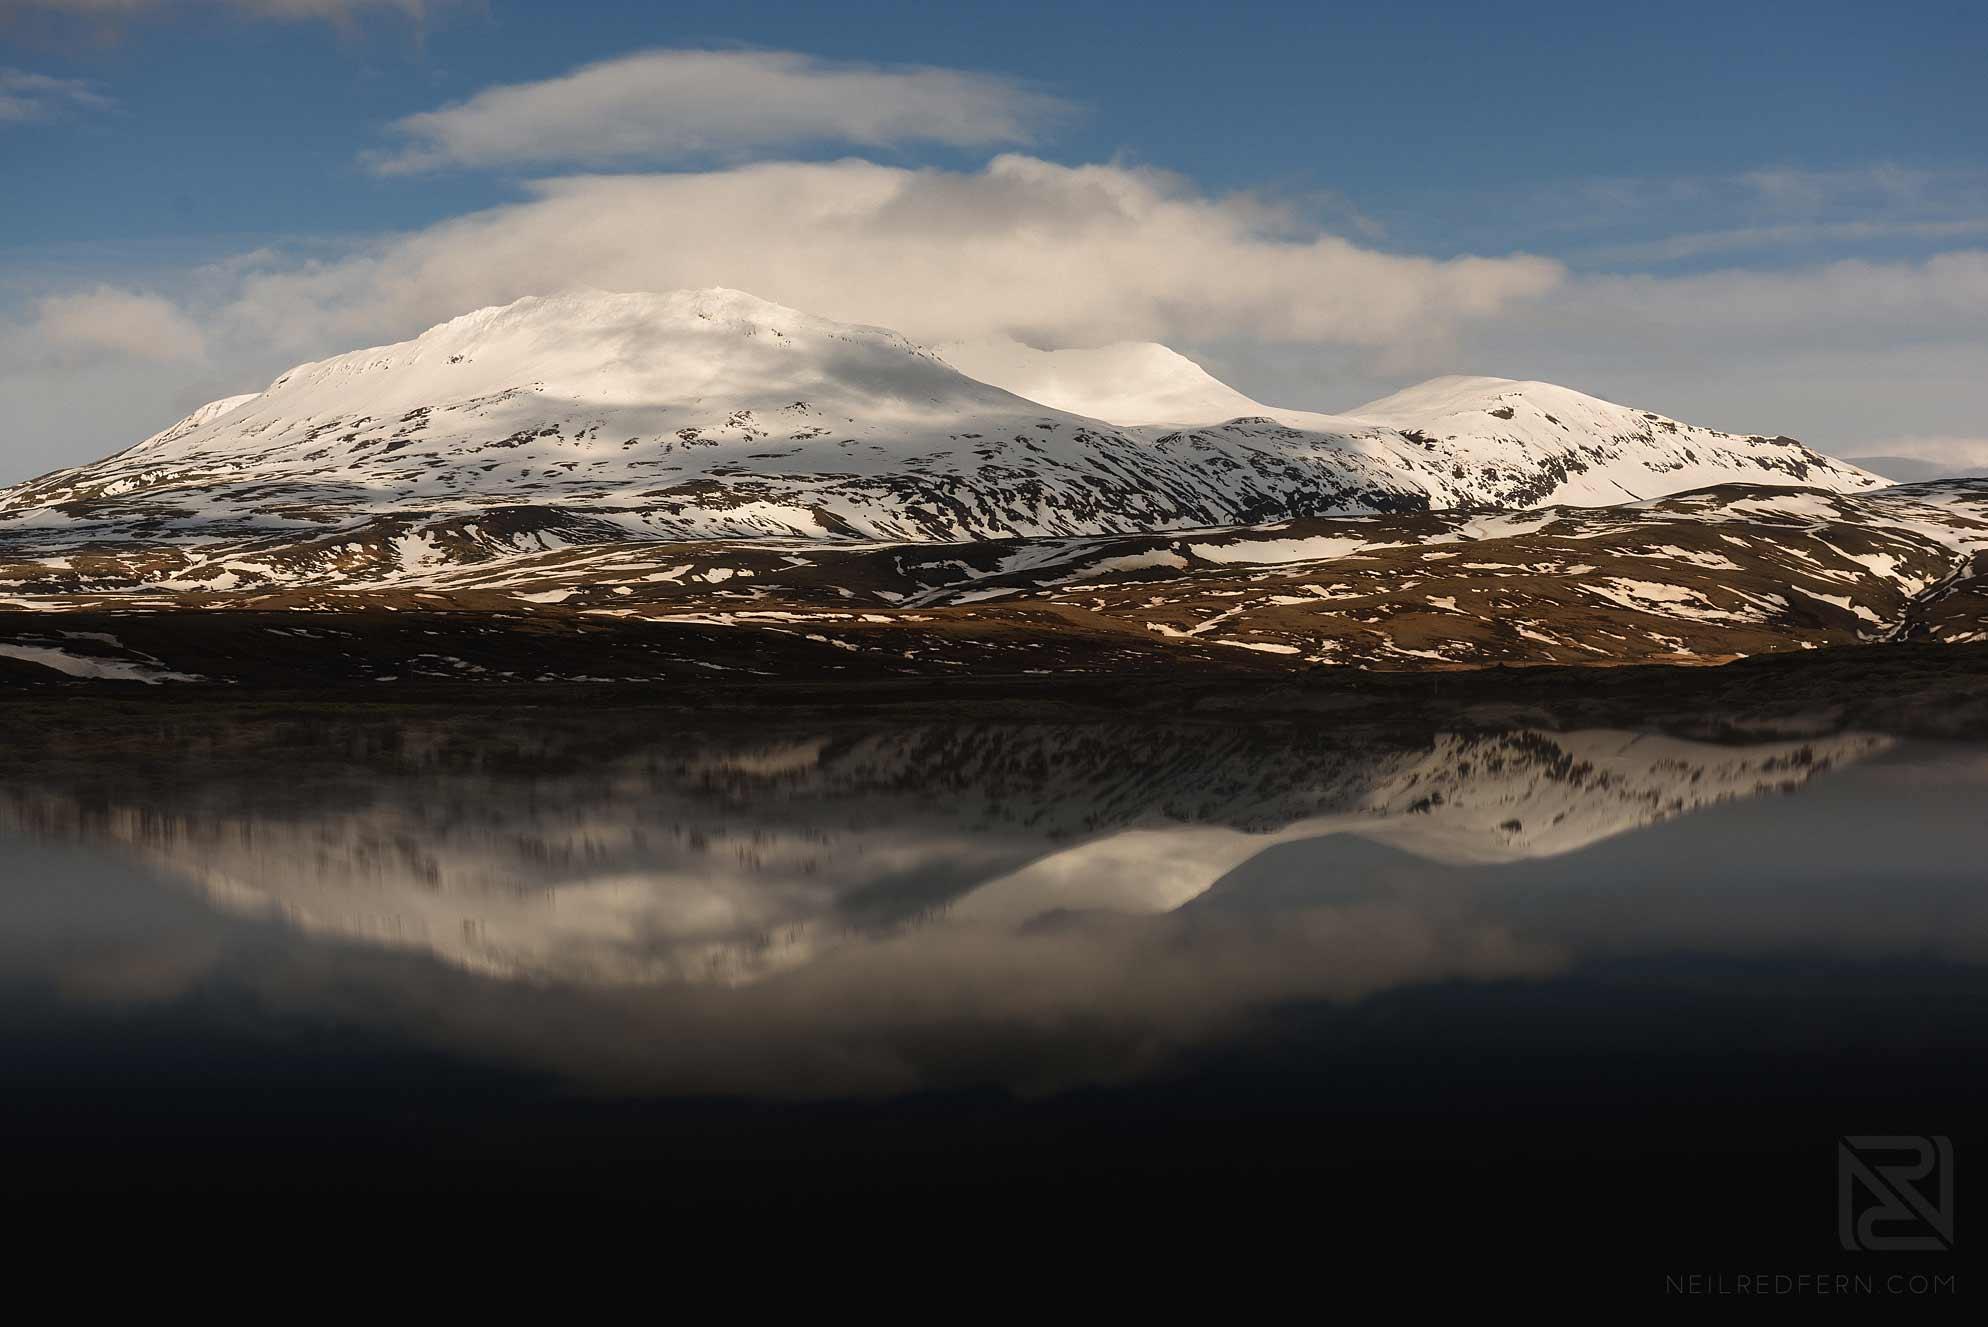 19-iceland-photograph-mountain